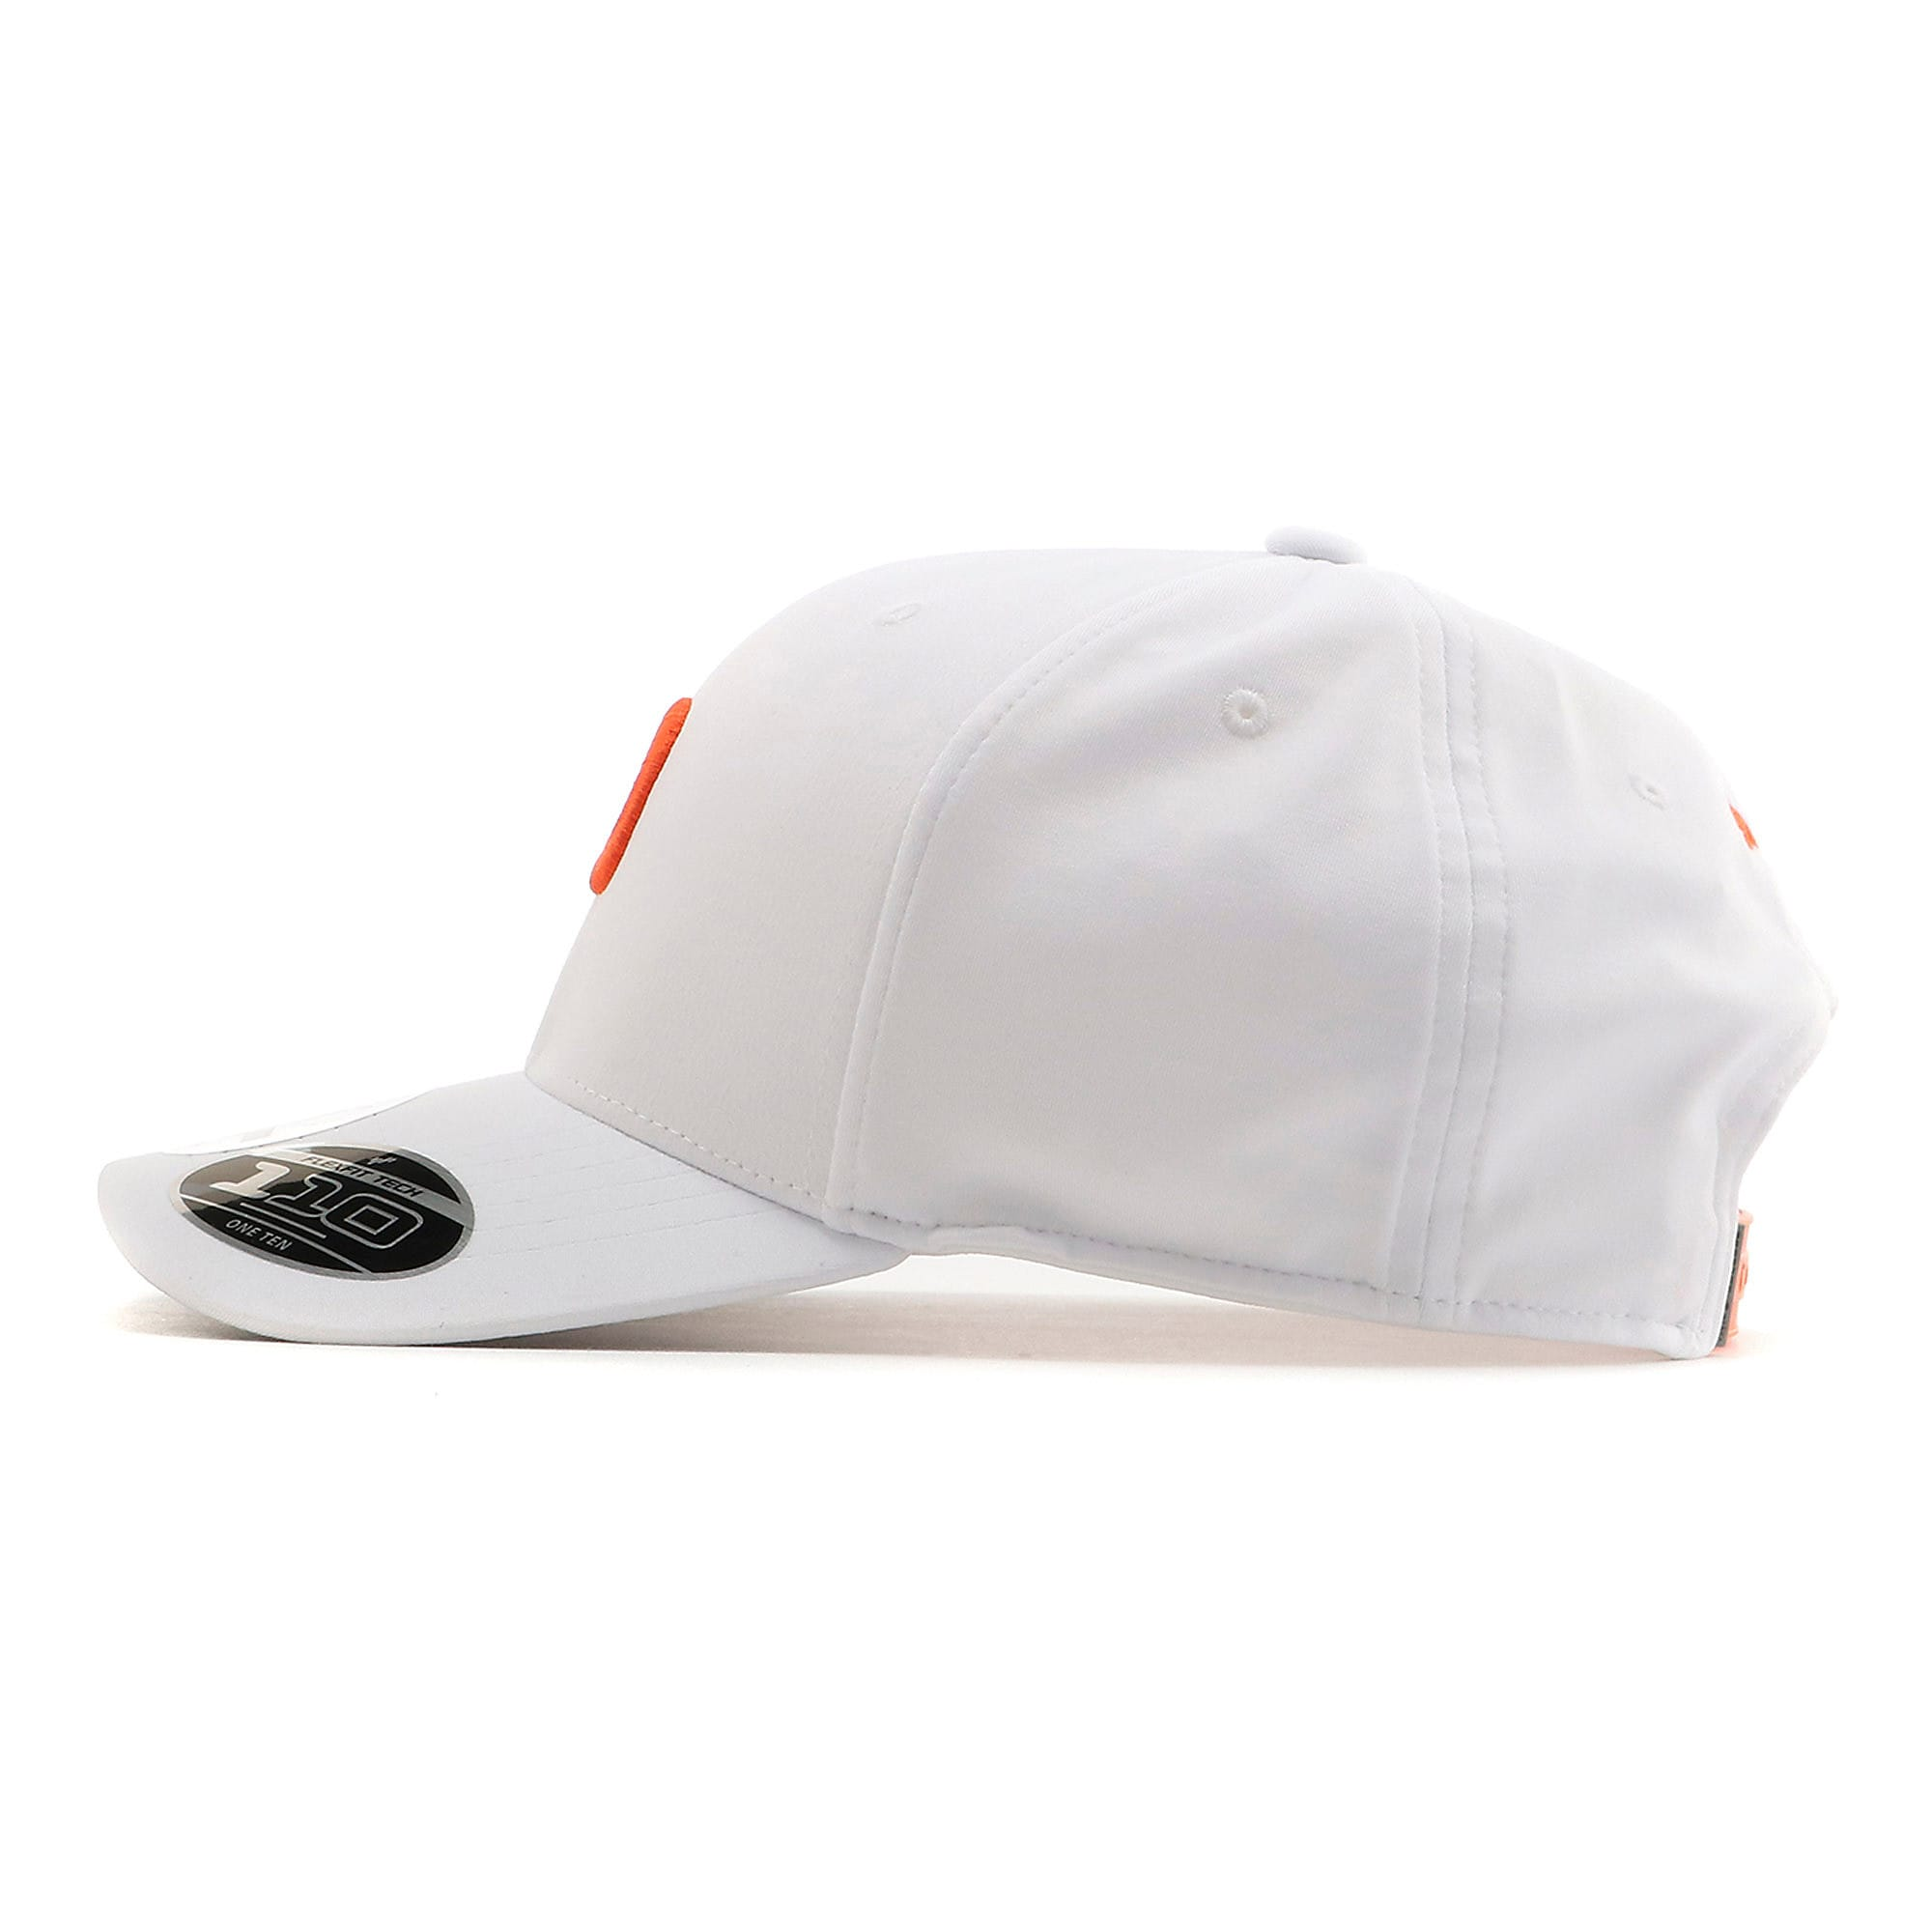 Thumbnail 3 of ゴルフ Pマークスナップバックキャップ, Bright White-Vibrant Orange, medium-JPN